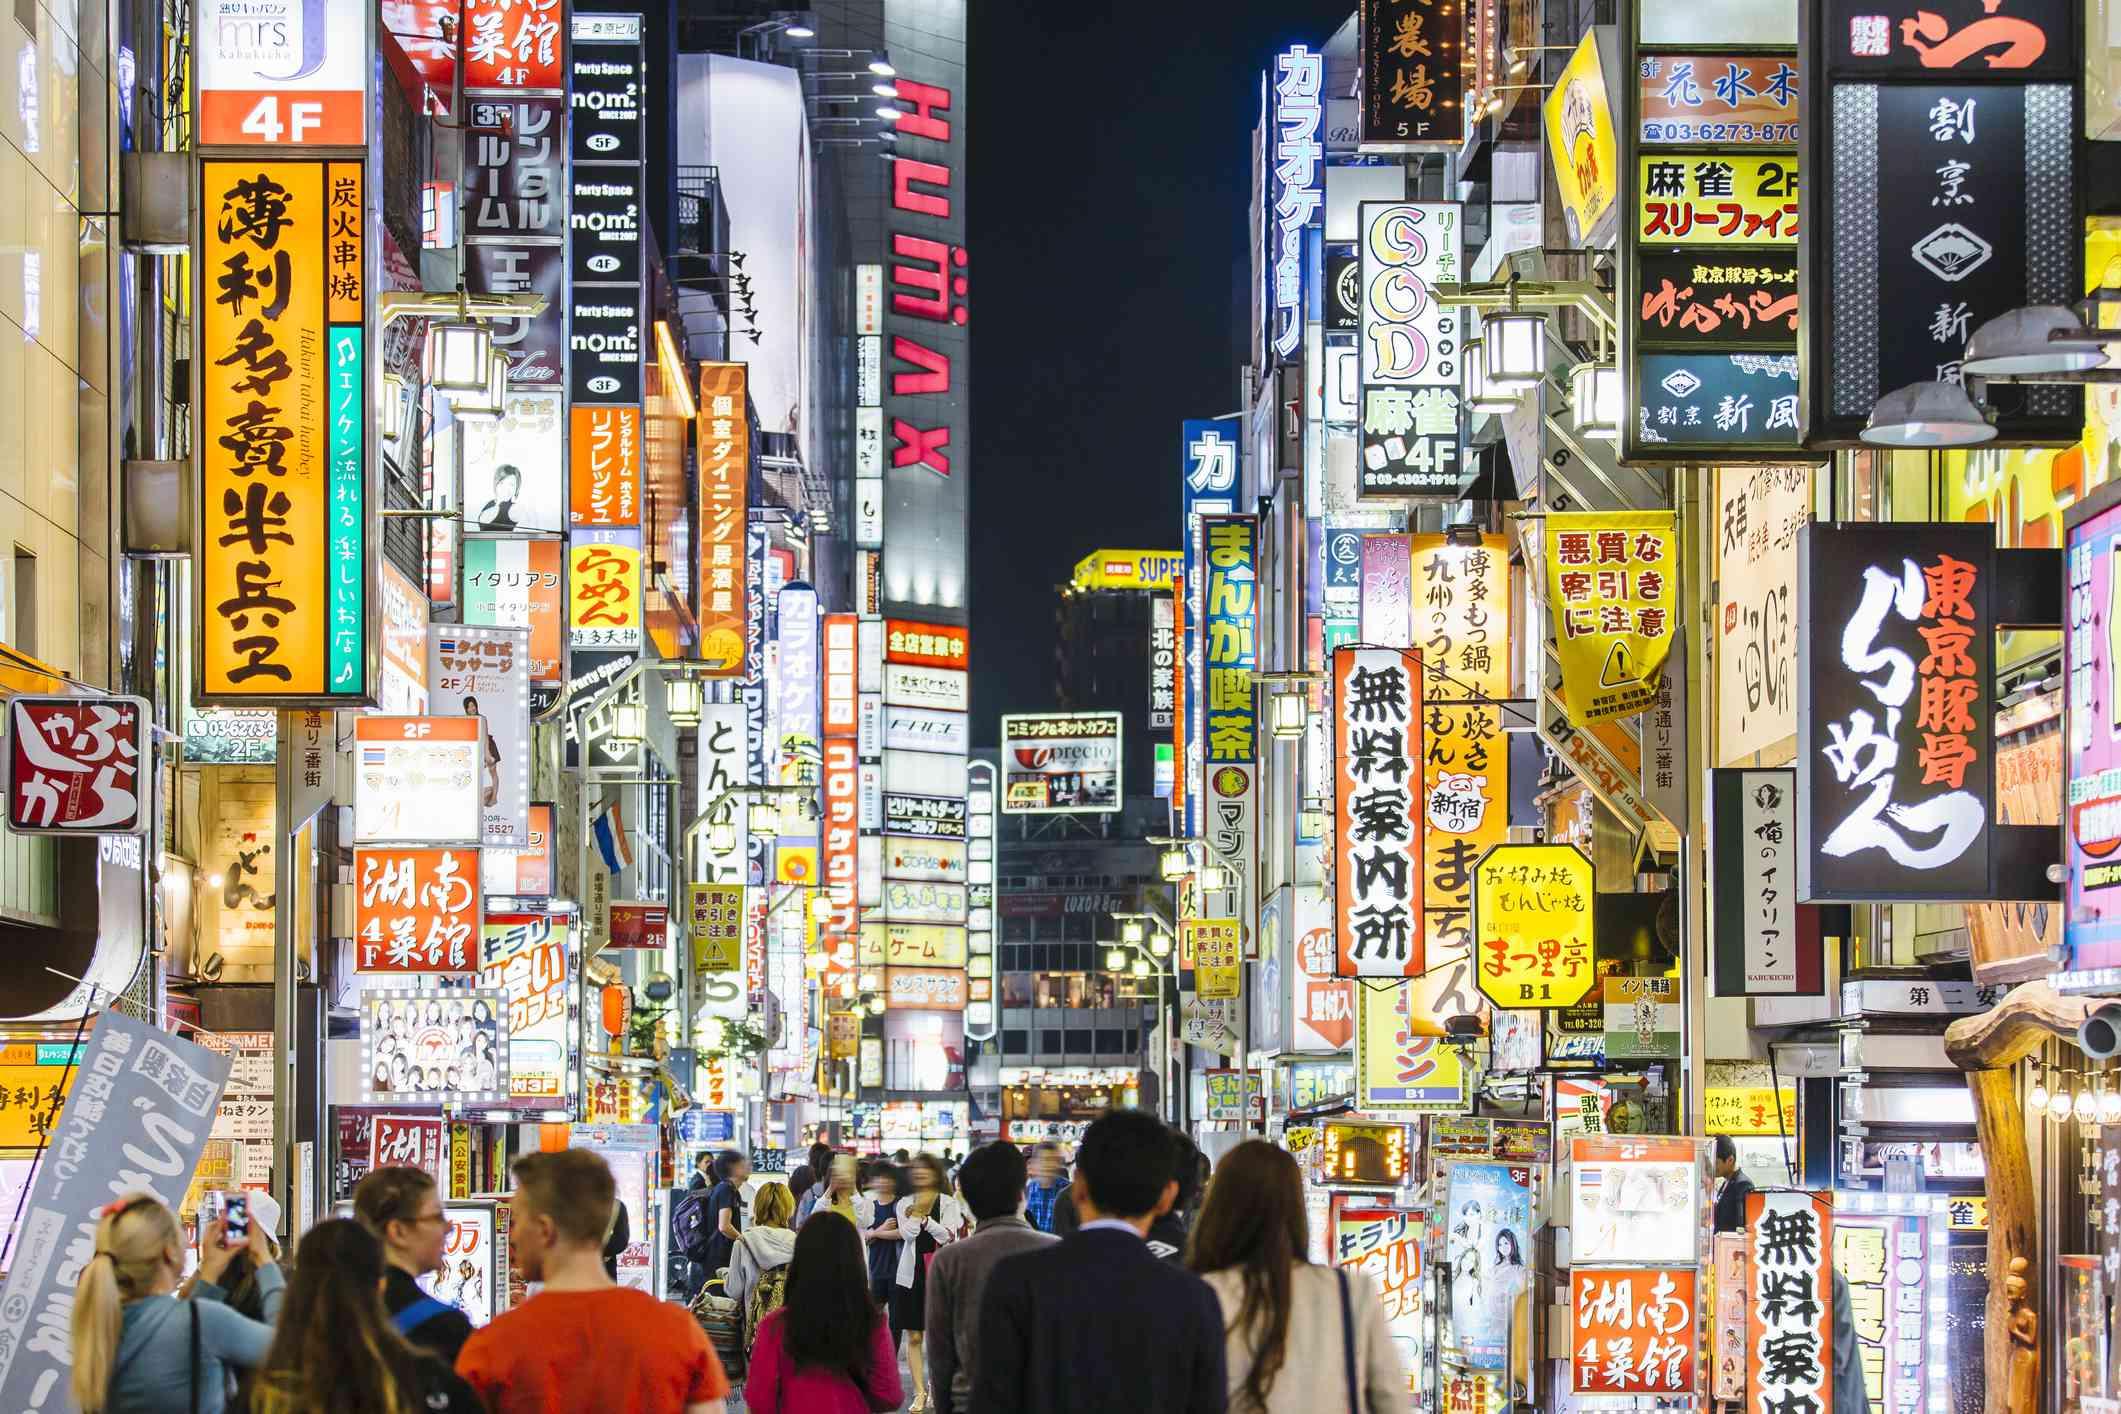 Crowds of people walking among illuminated neon signs at Kabukicho road in Shinjuku district, Tokyo, Japan